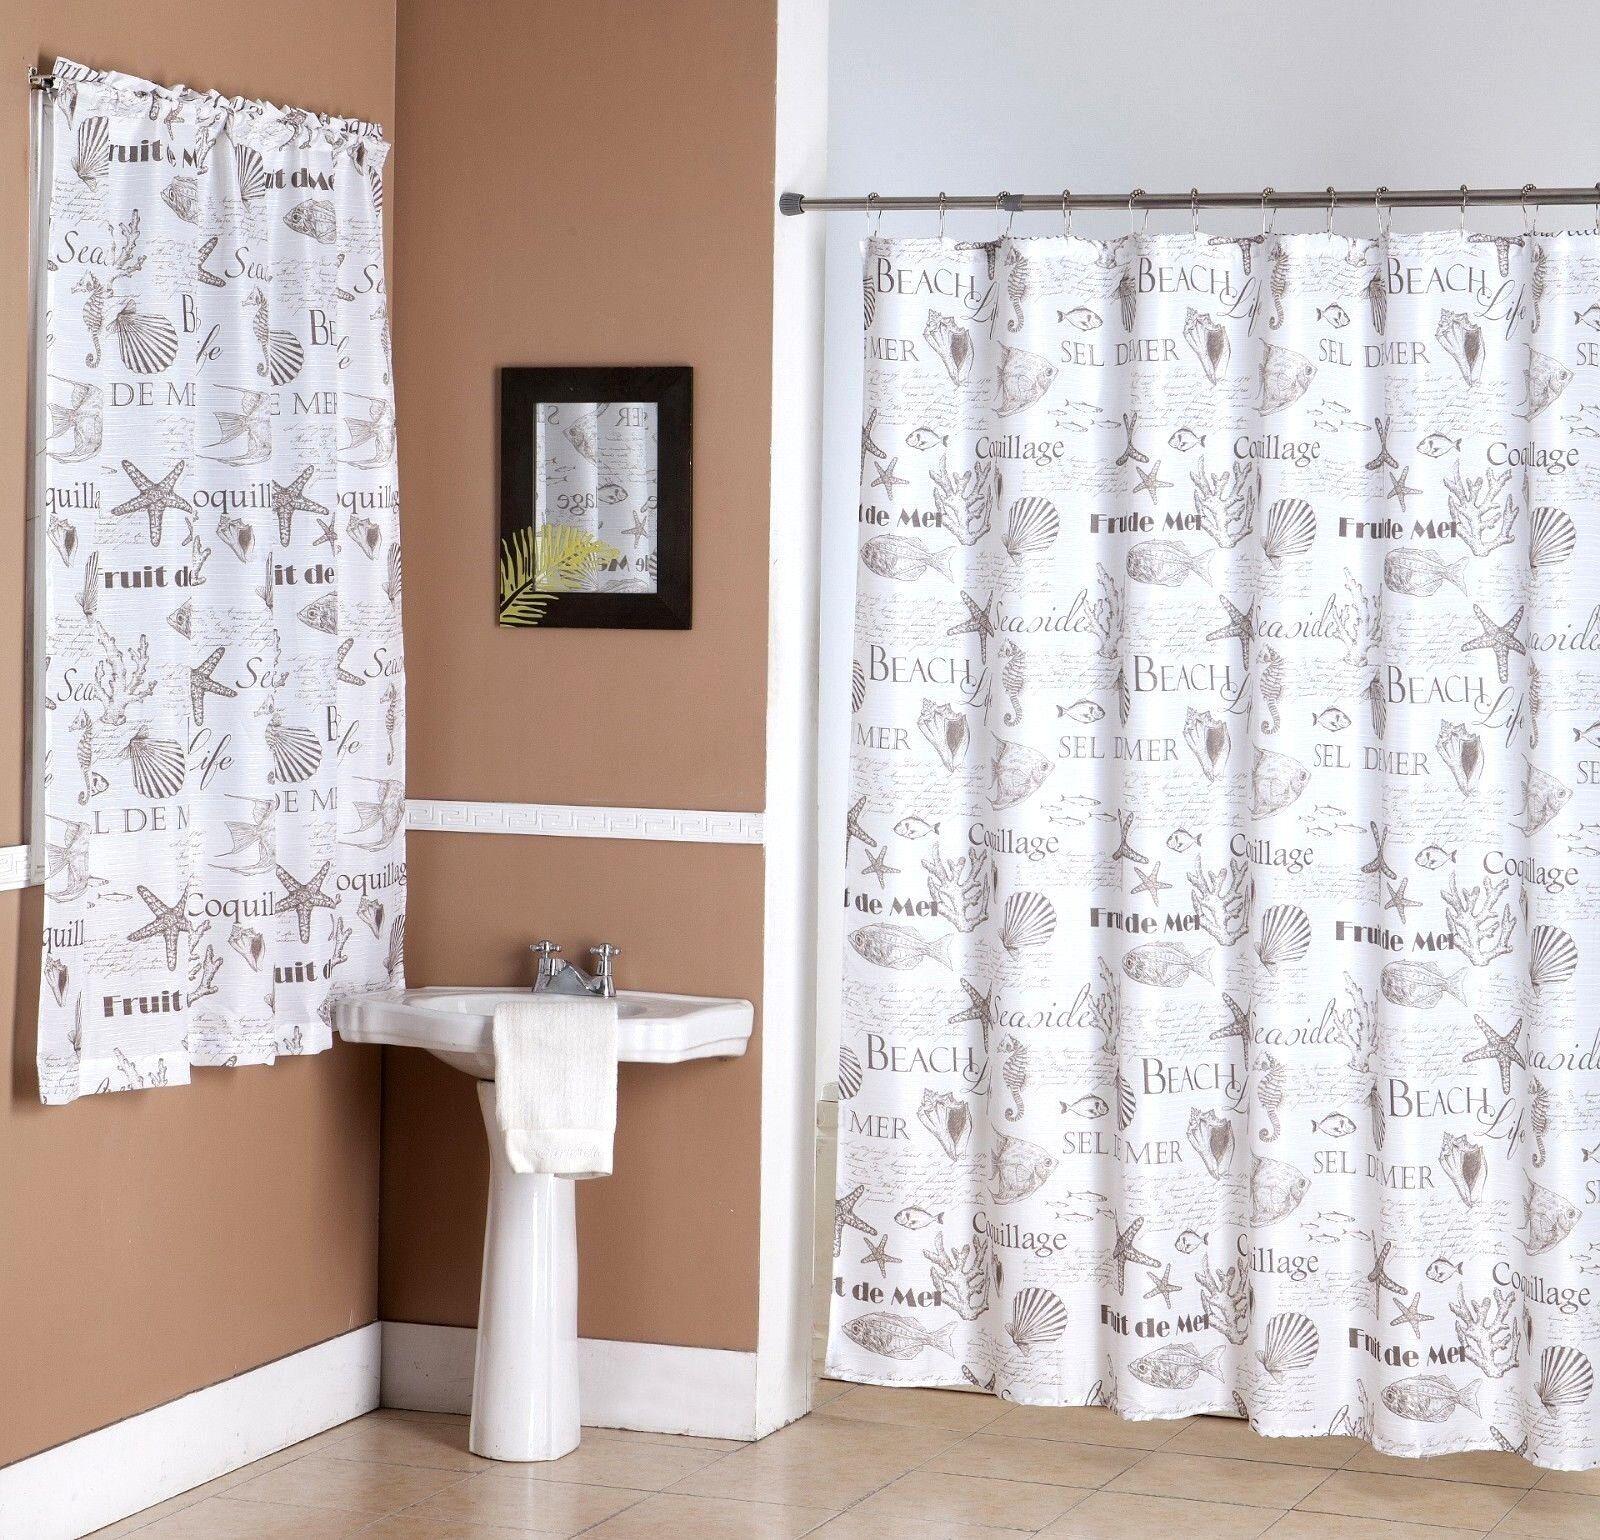 14pc Ocean Shells Starfish Sea Set Fabric Bathroom Window Shower Curtain Hooks